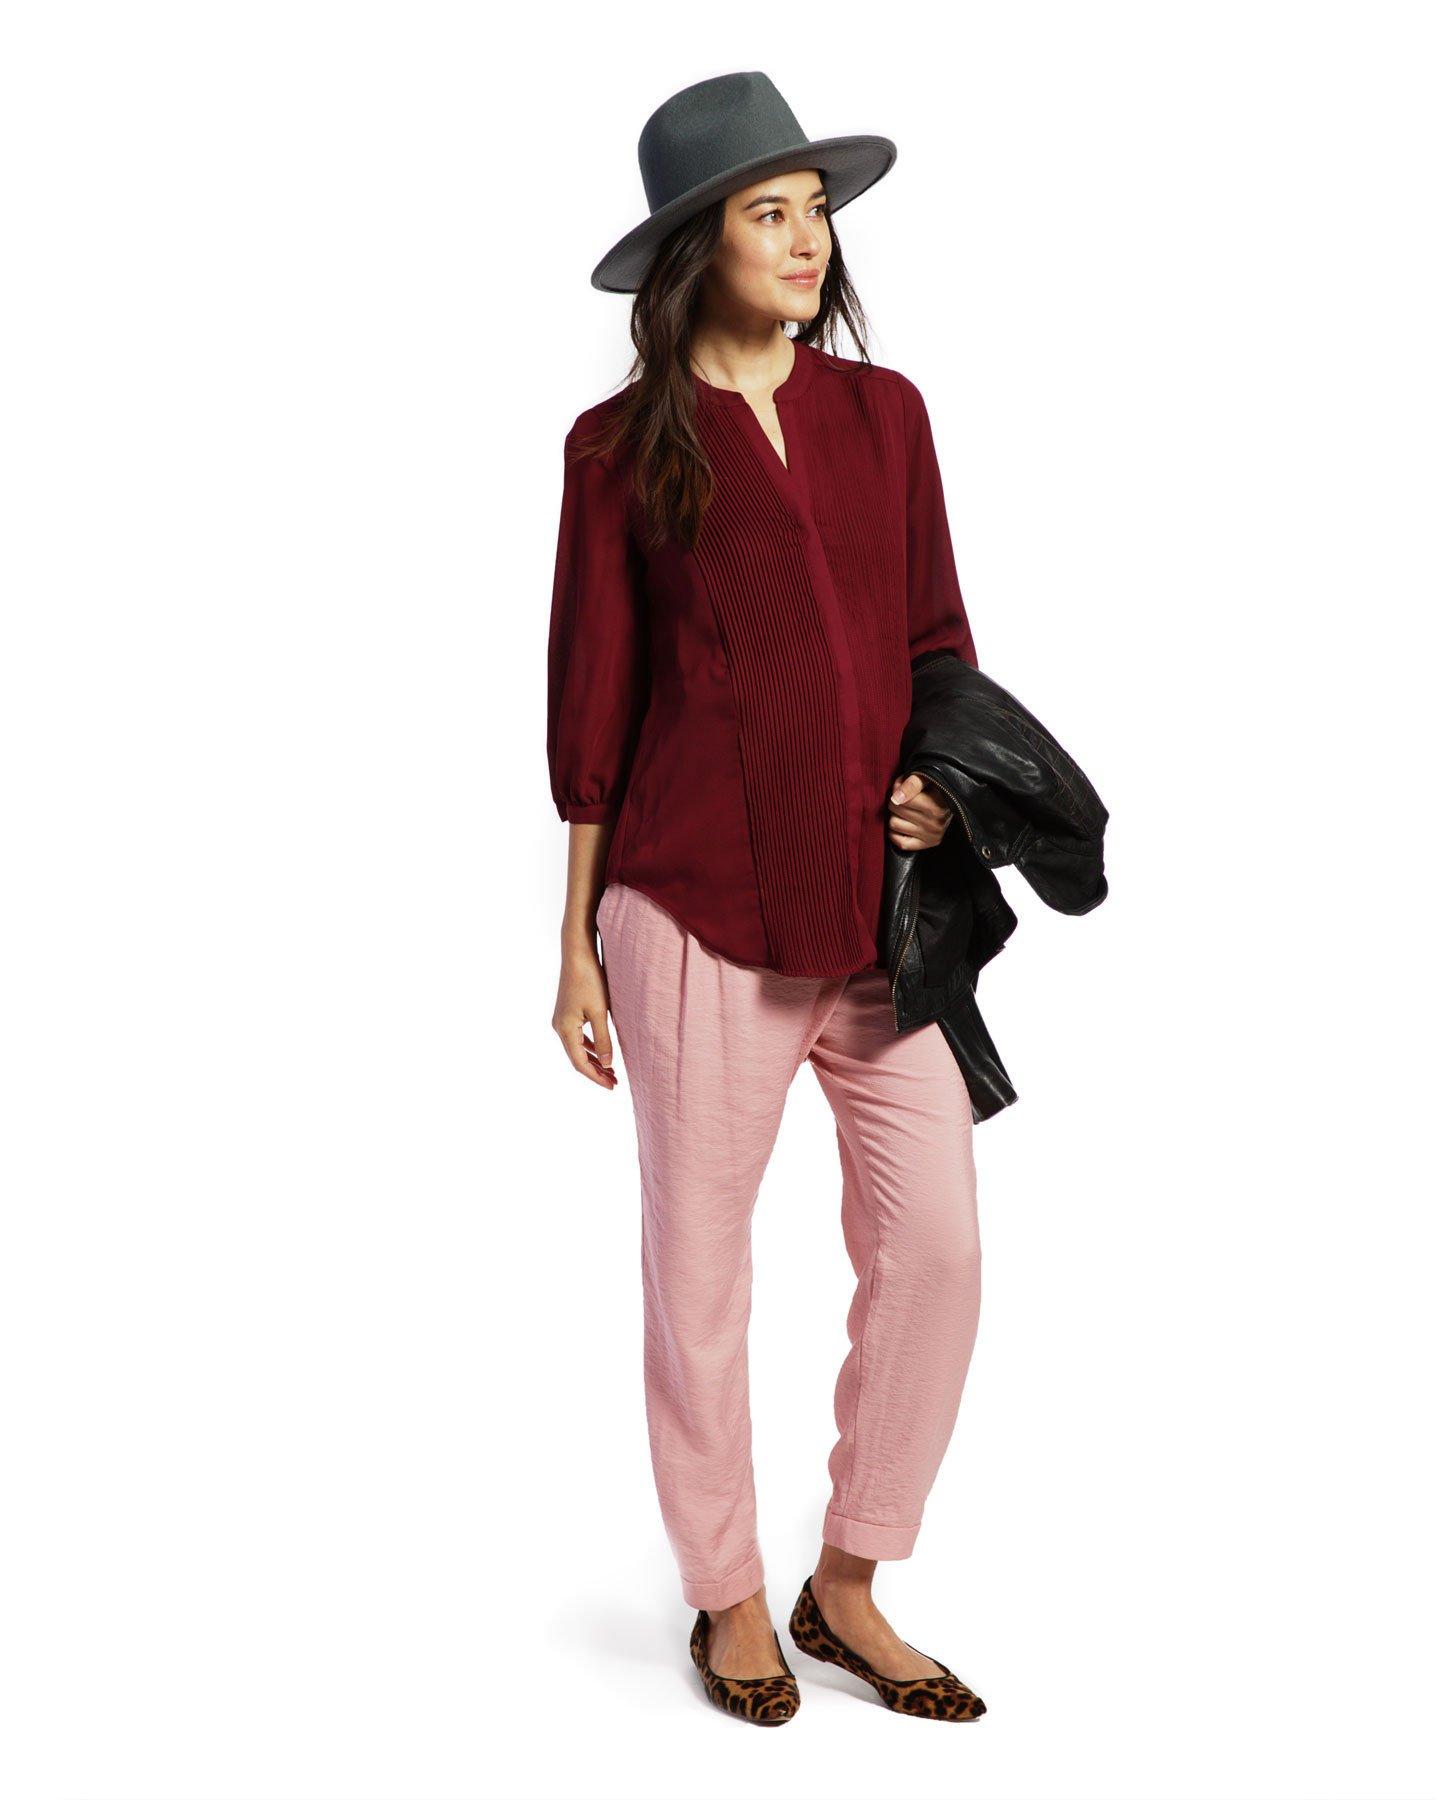 Audrey - Burgundy Tuxedo Top